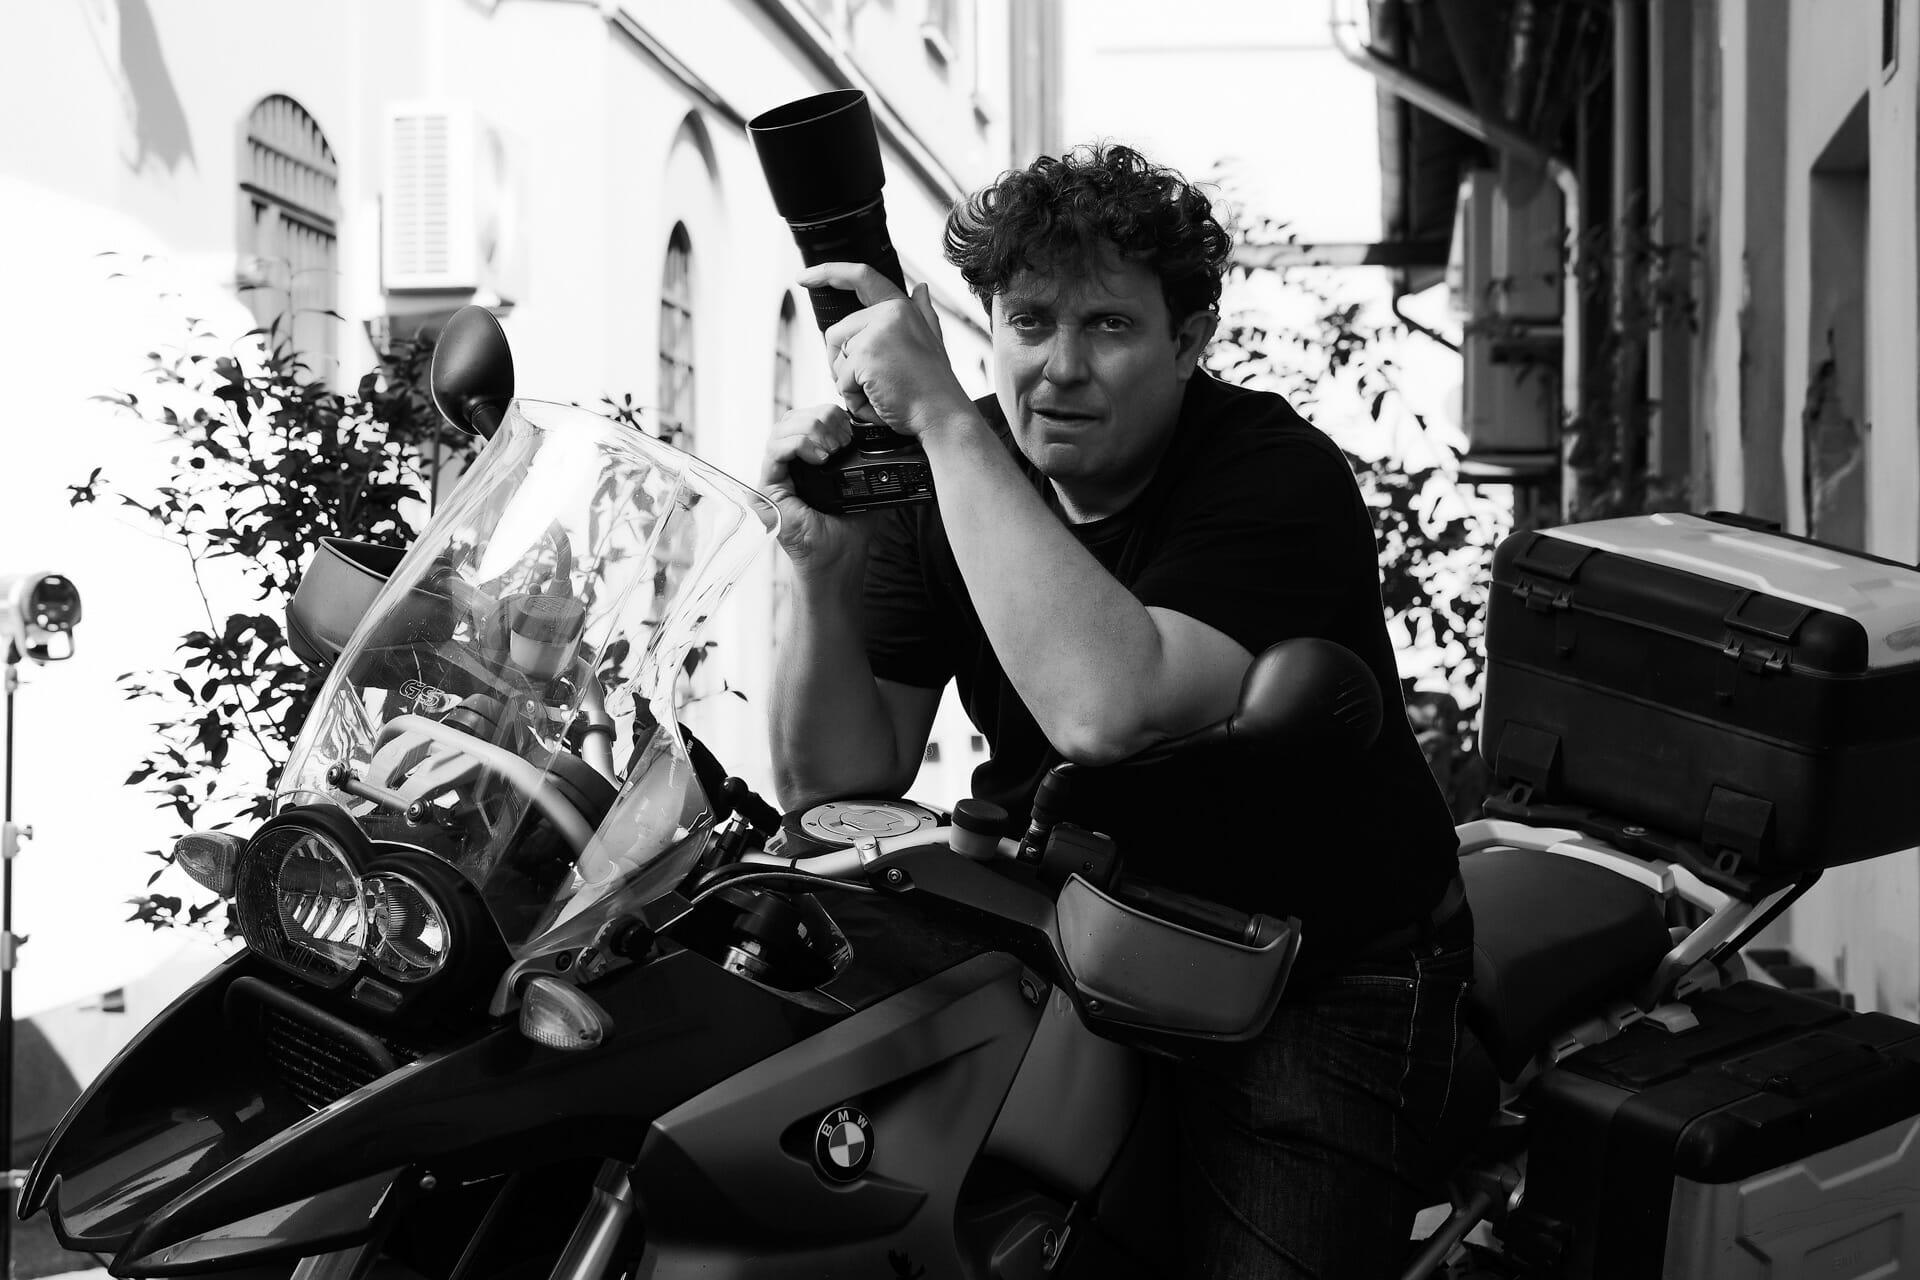 Daniel Grandolfi Photographer Milano Fashion and Beauty Tortona area FASHIONBLOG Advertising Photographer Porta Genova editorial photographer magazines Vogue Professional portrait photographer Profoto Lighting Canon cameras